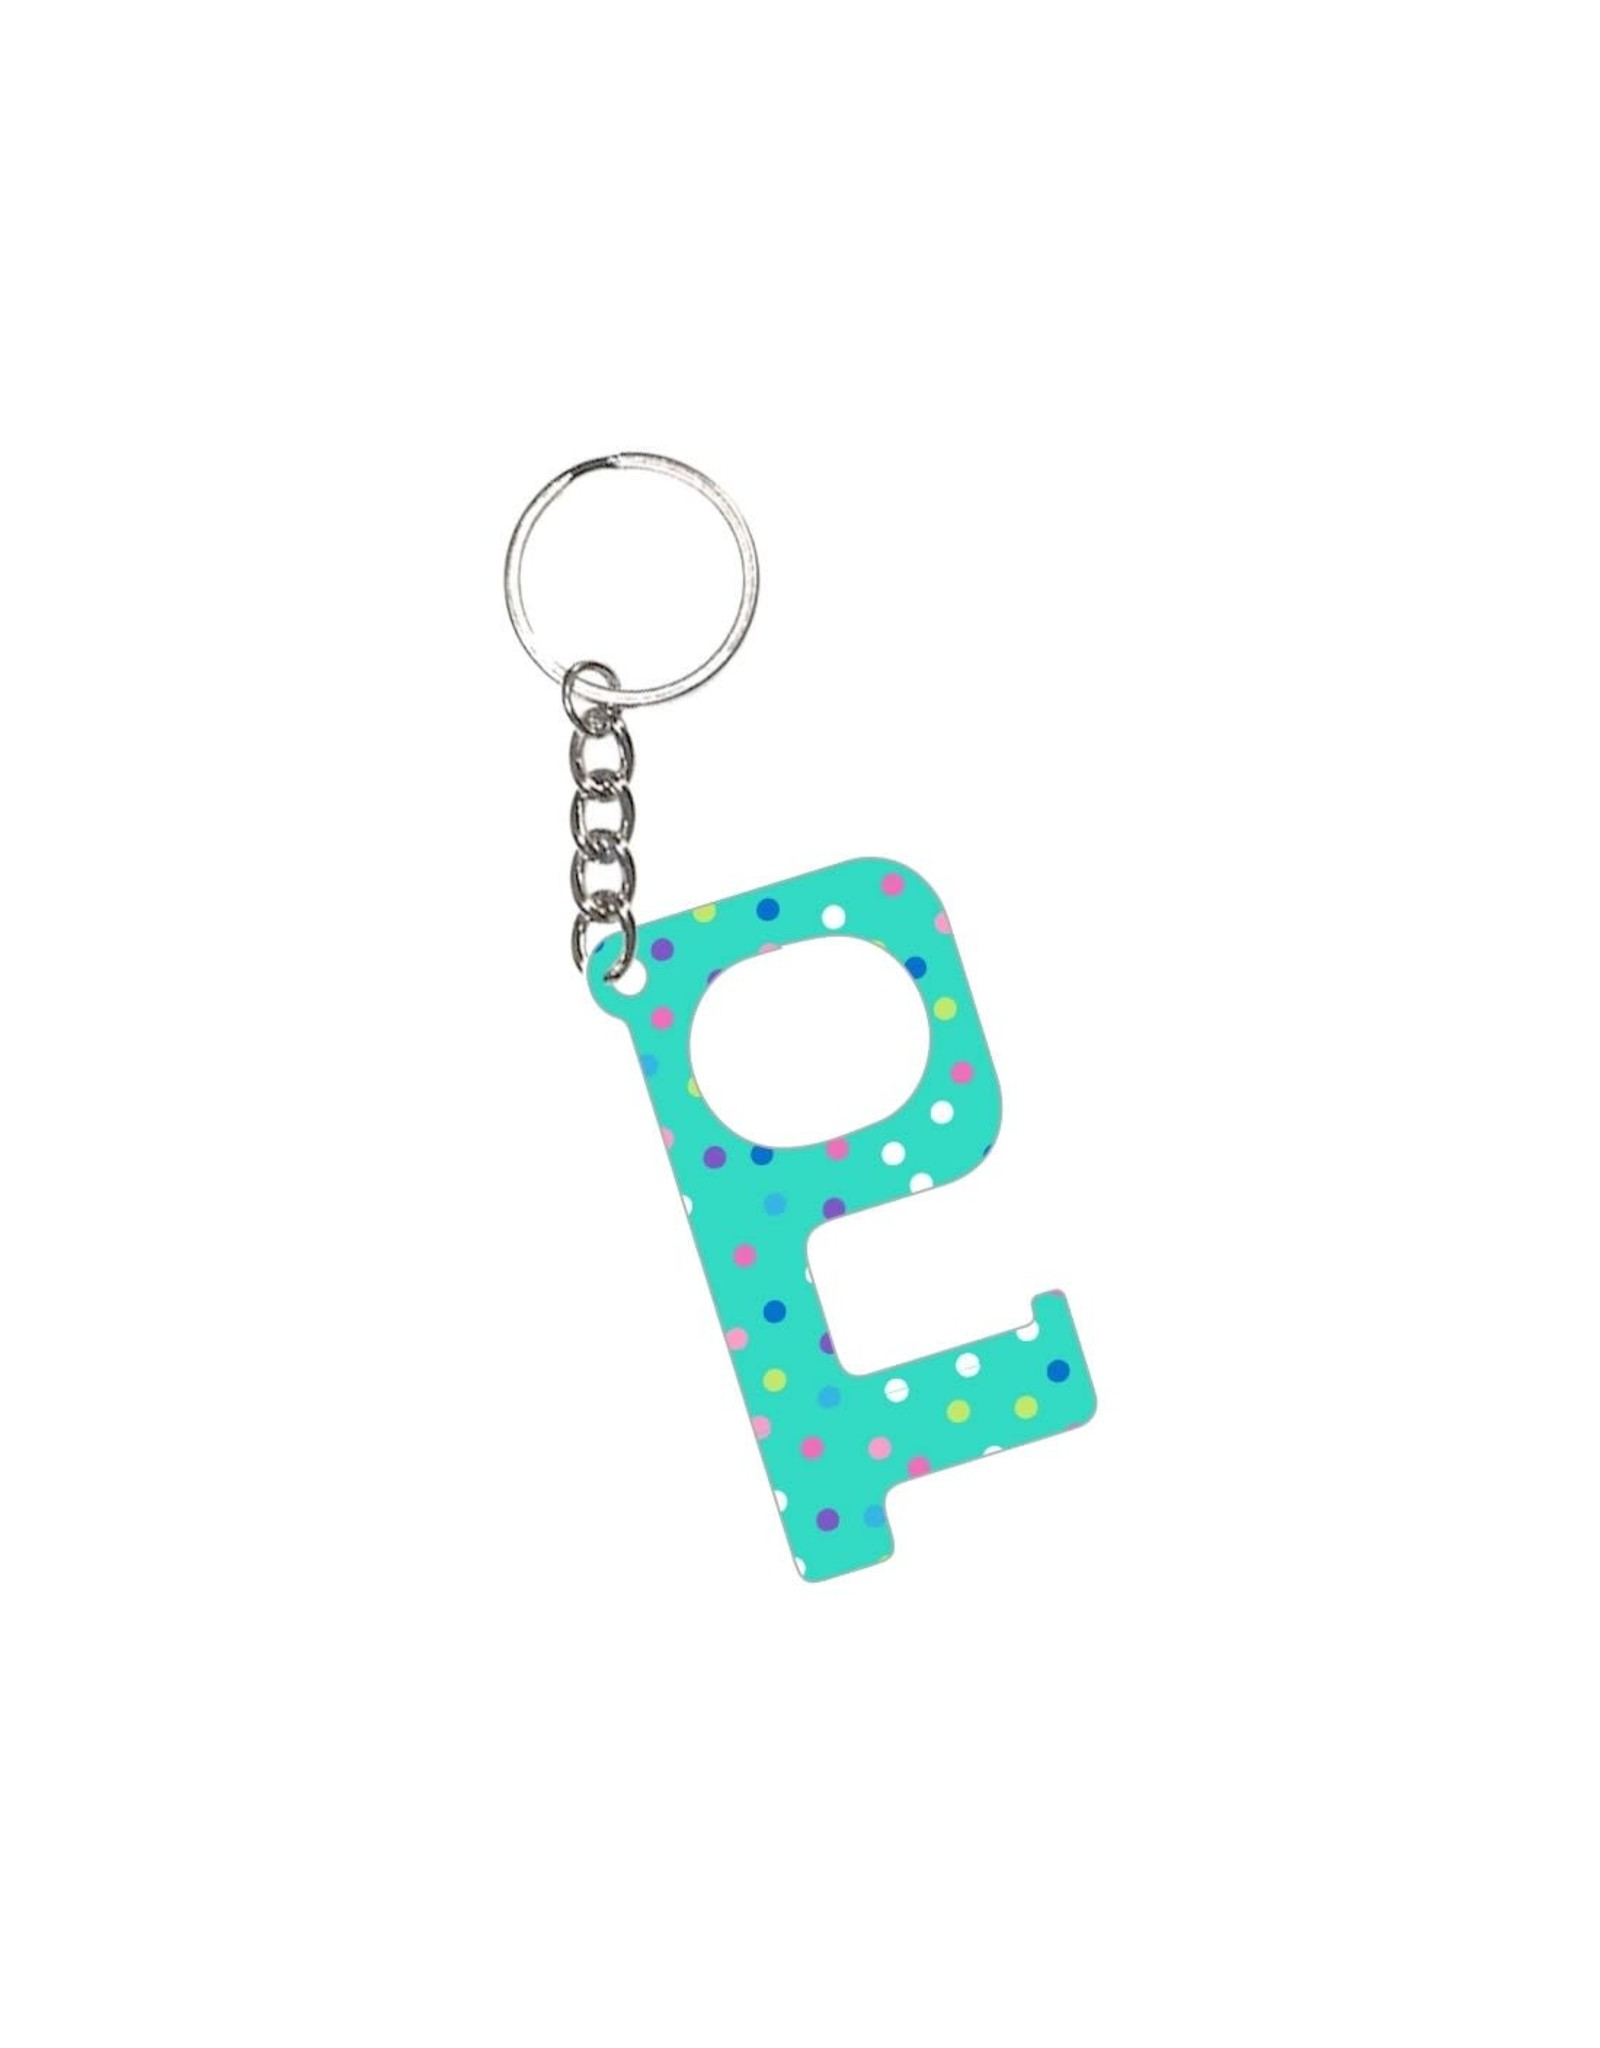 Acrylic Door Key, Lottie